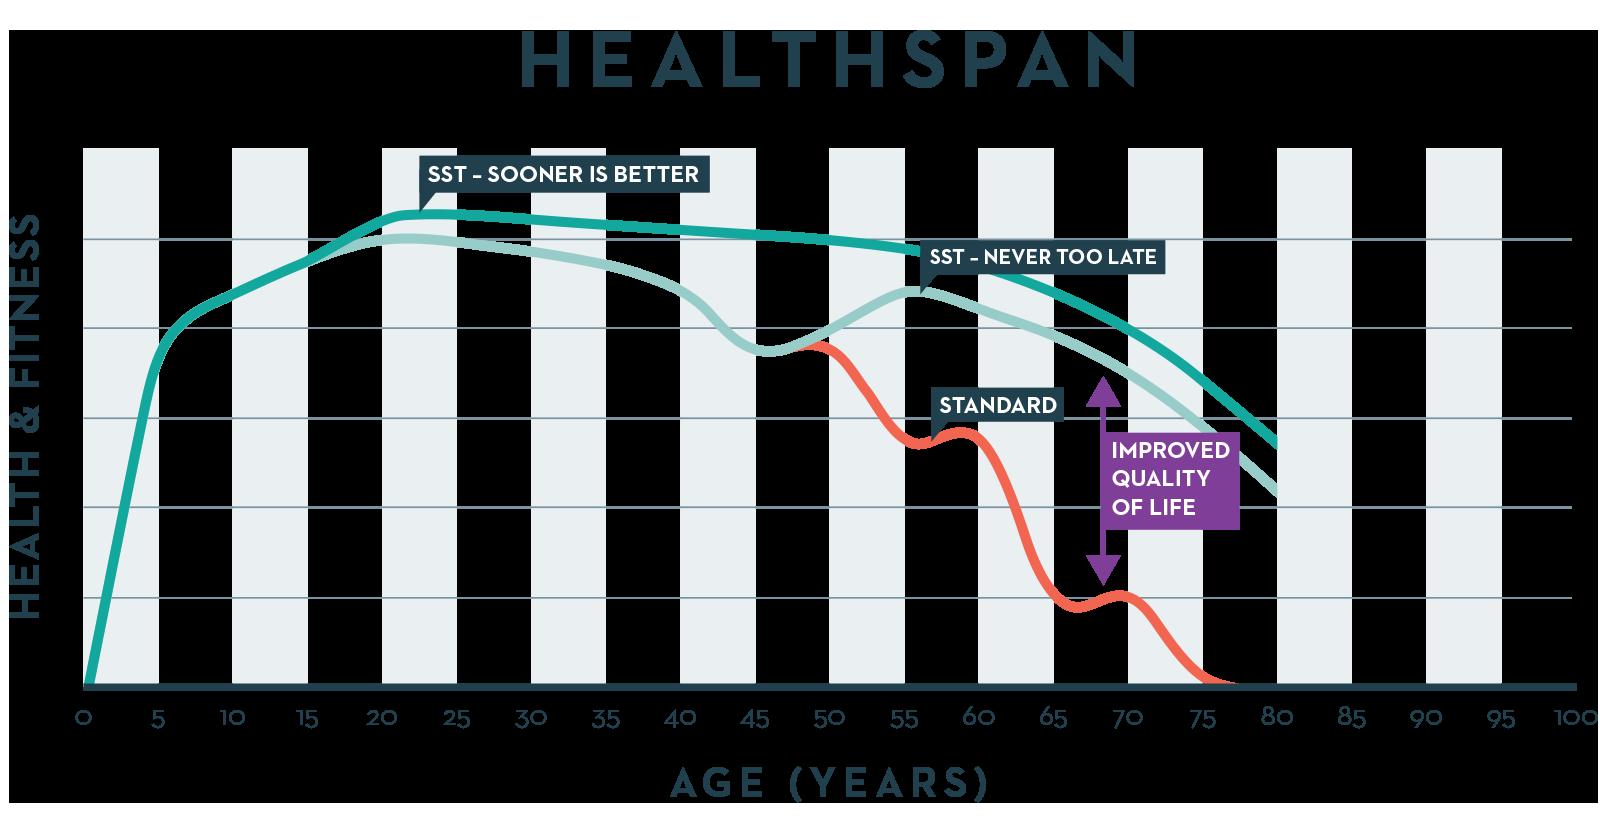 SST- Health Span